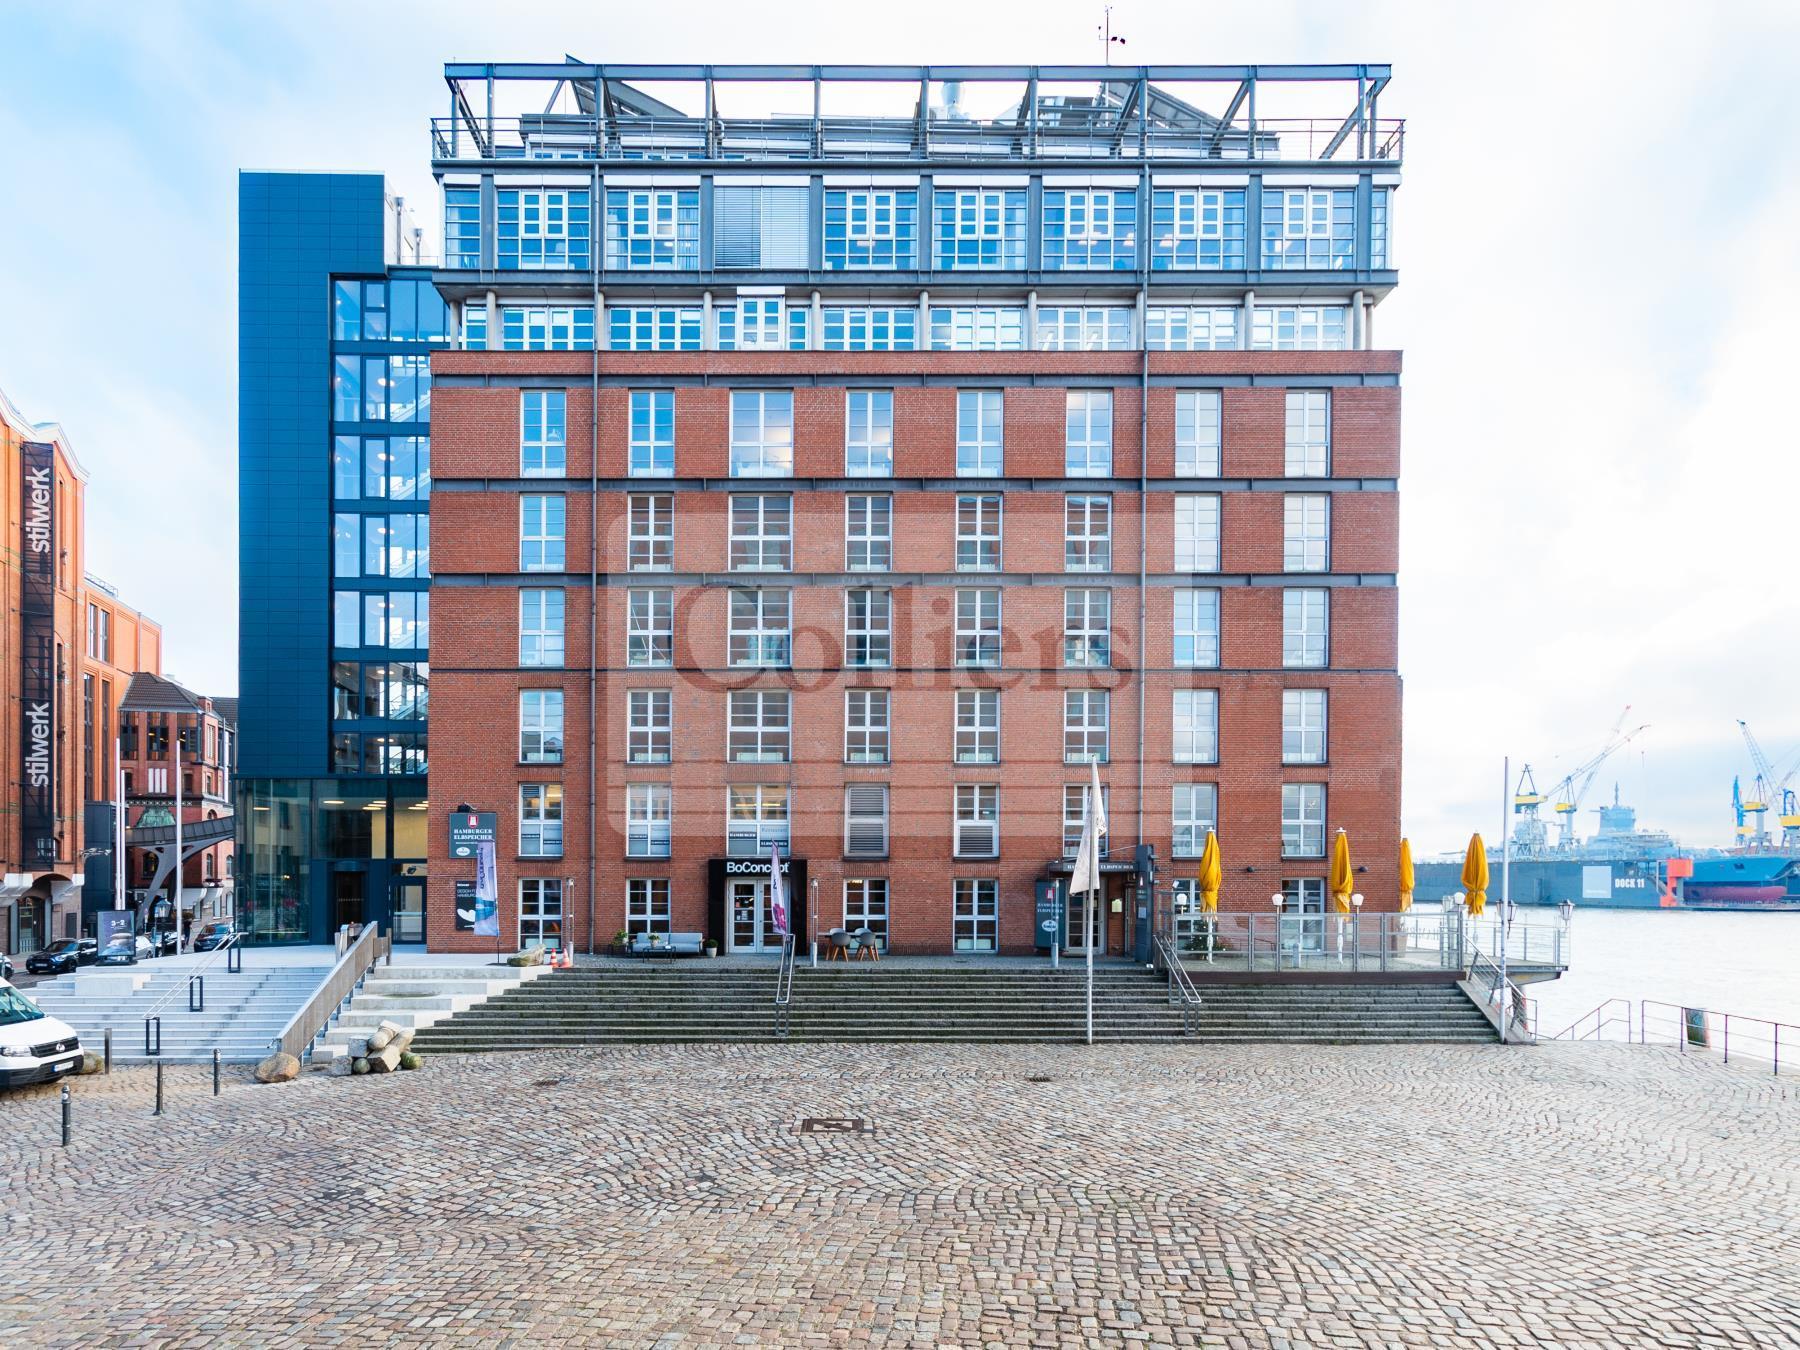 Büro an der Elbe